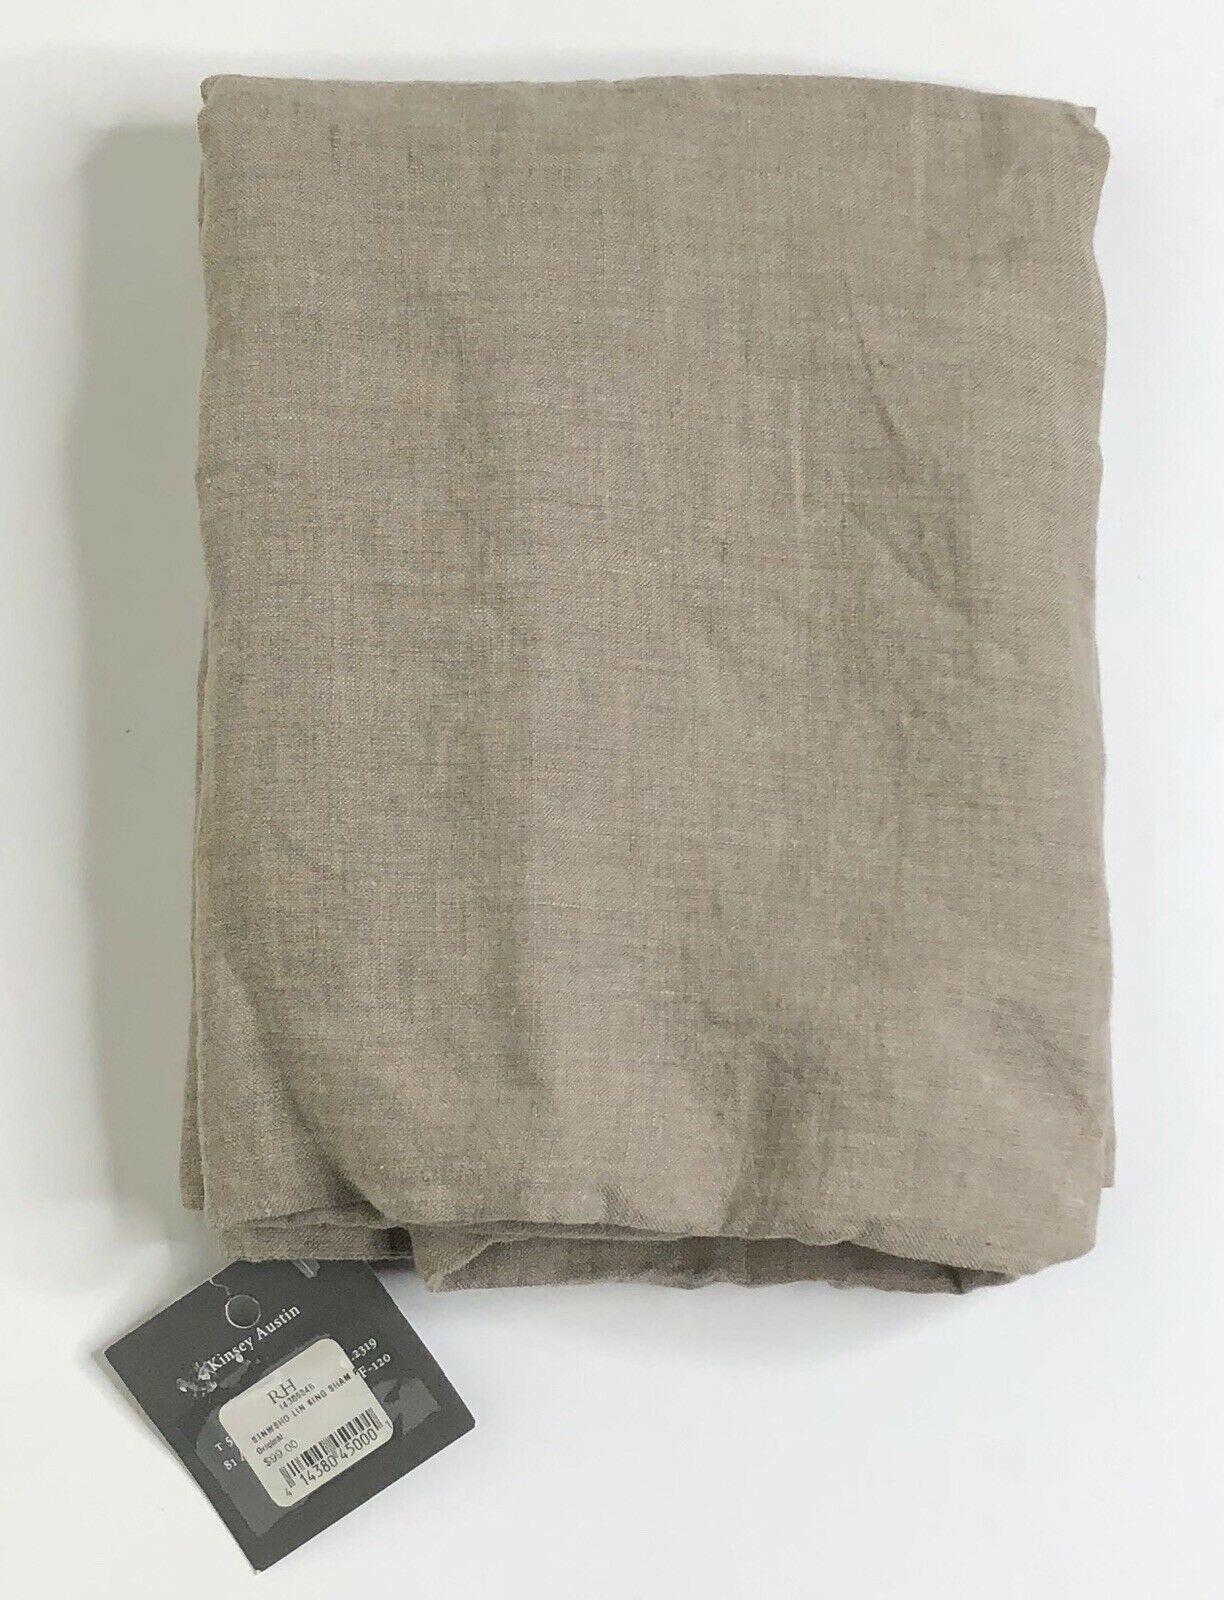 Restoration Hardware Stonewashed Belgian Linen King Sham Prairie NEW $99 - $44.99